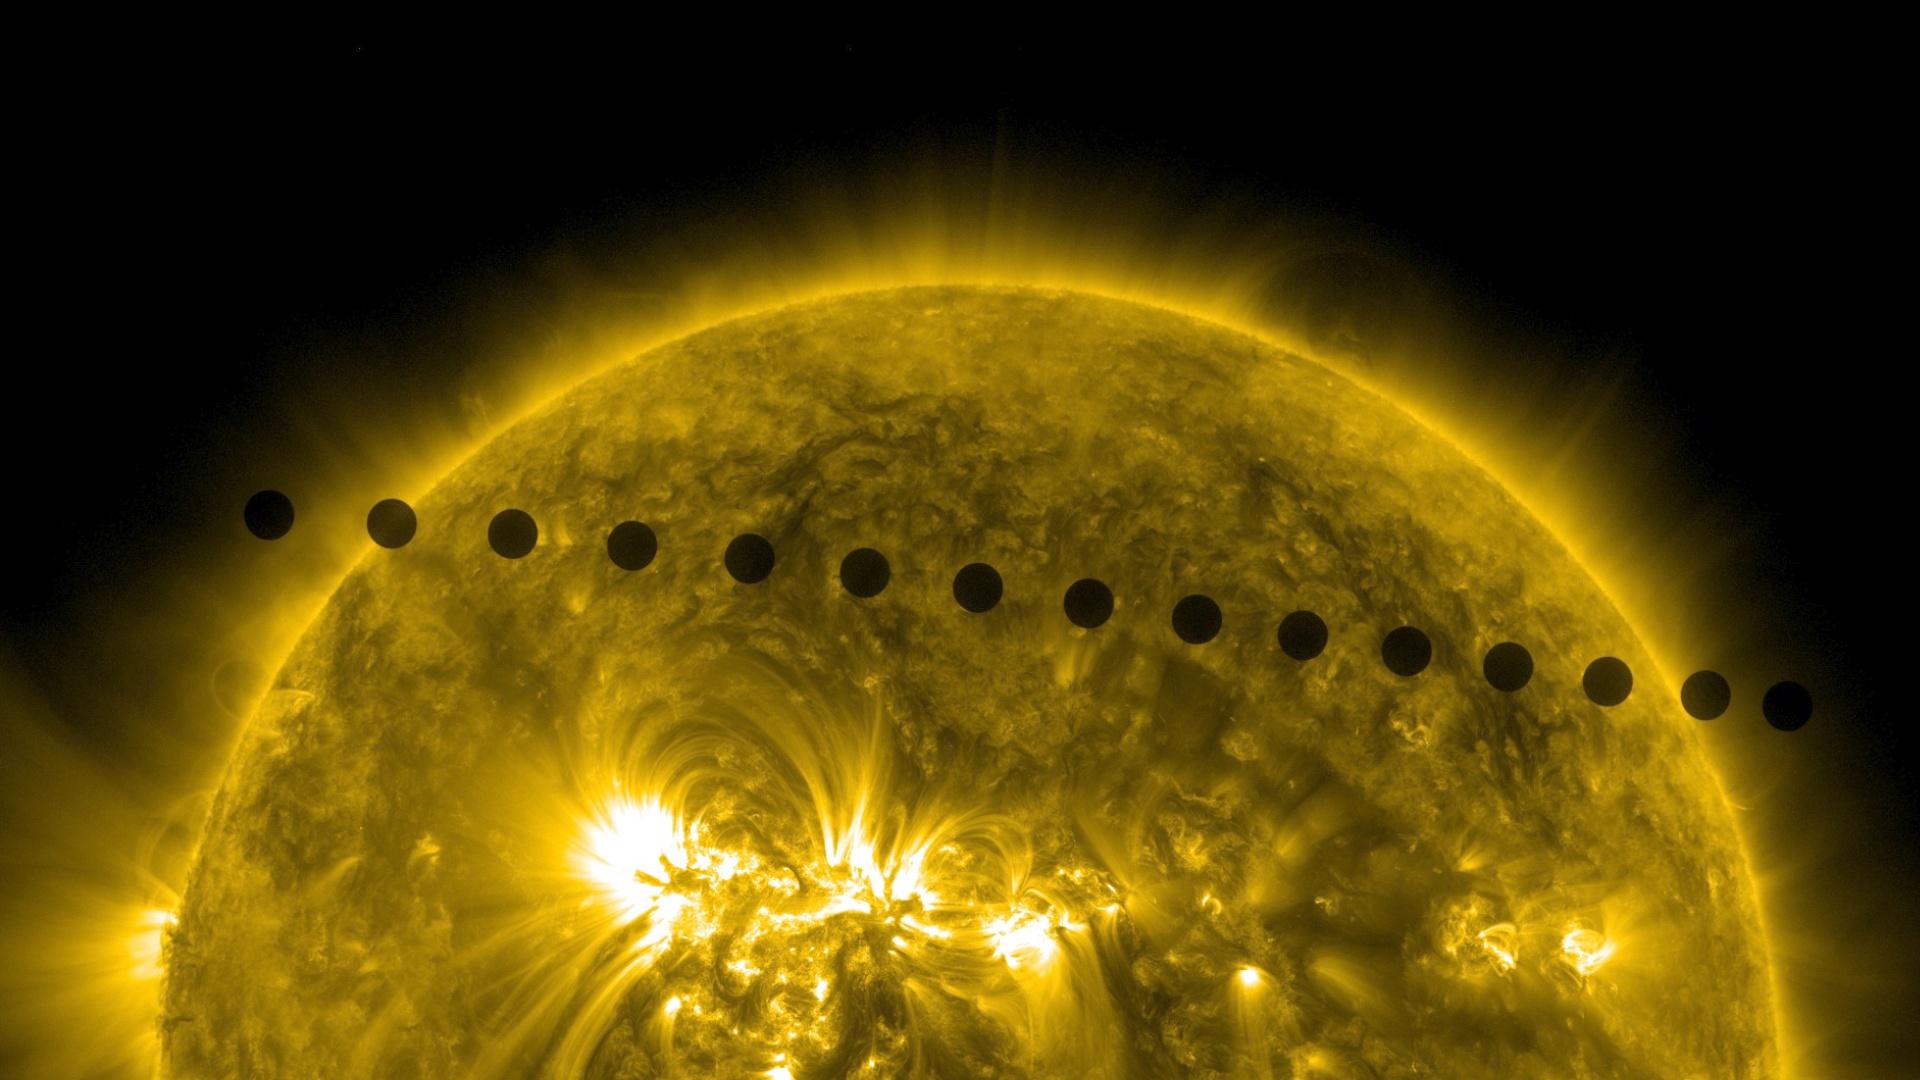 Tránsito de Venus a traves del Sol